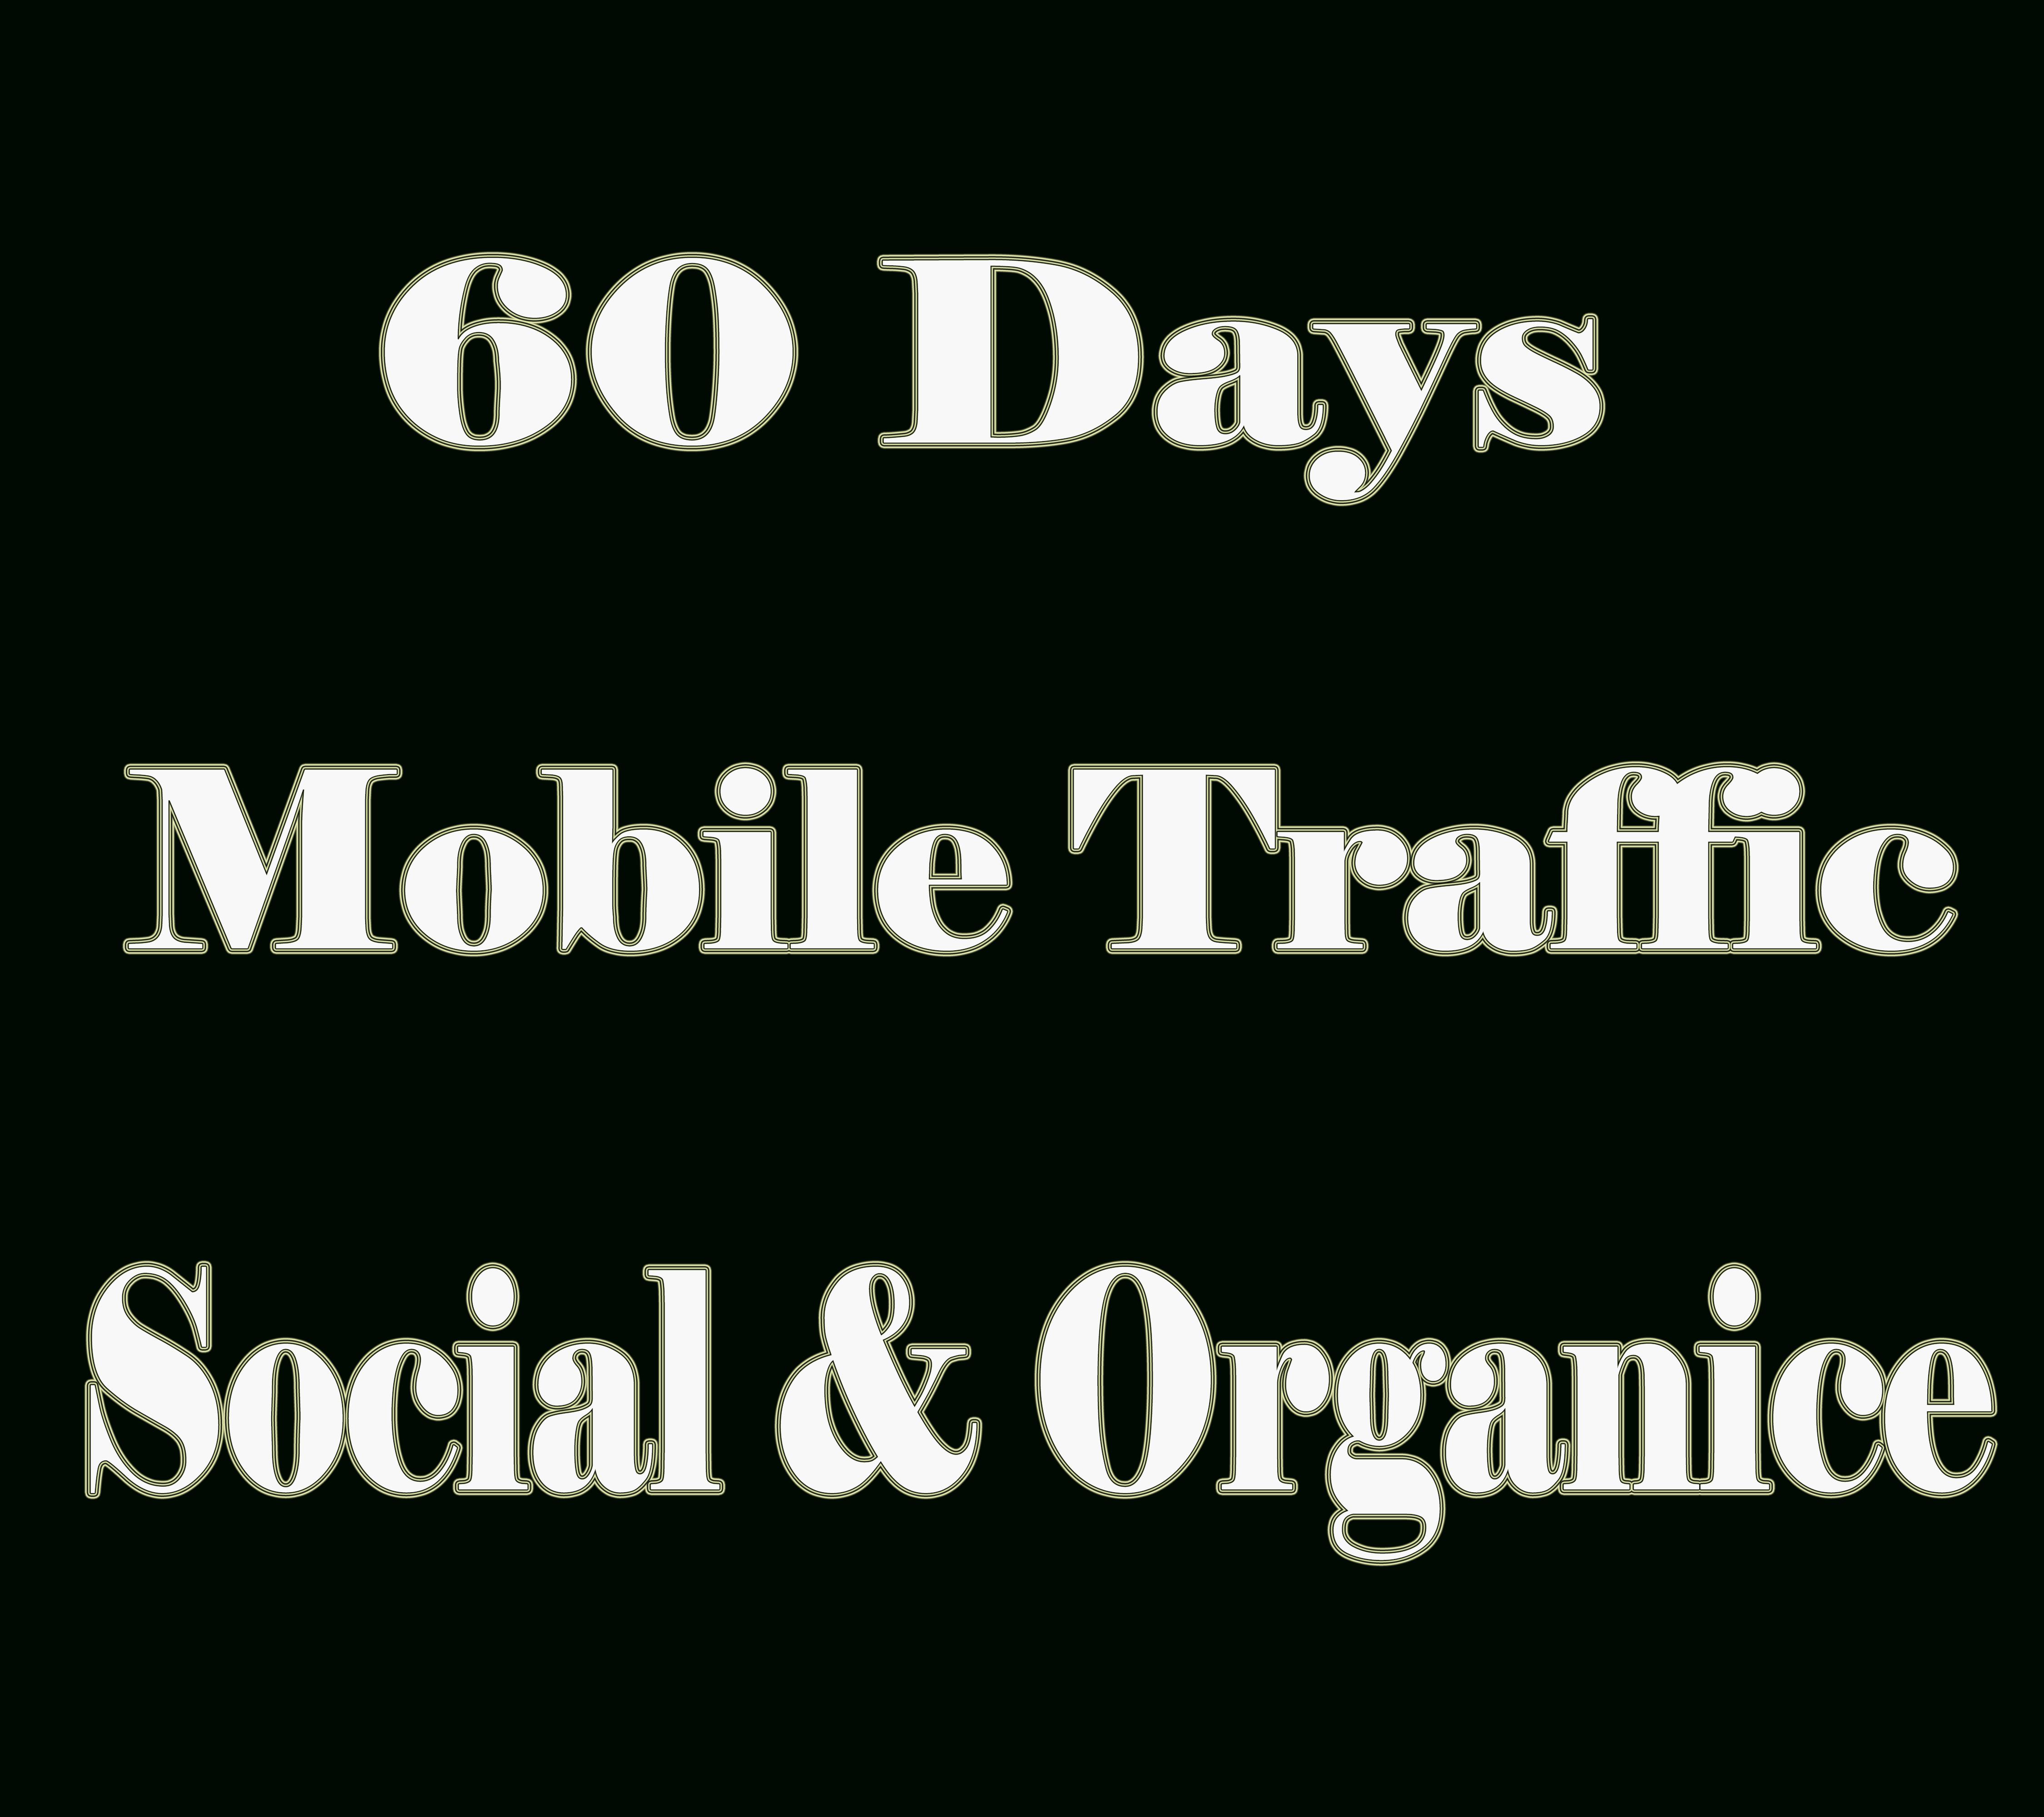 Get MOBILE Web Traffic 60 days